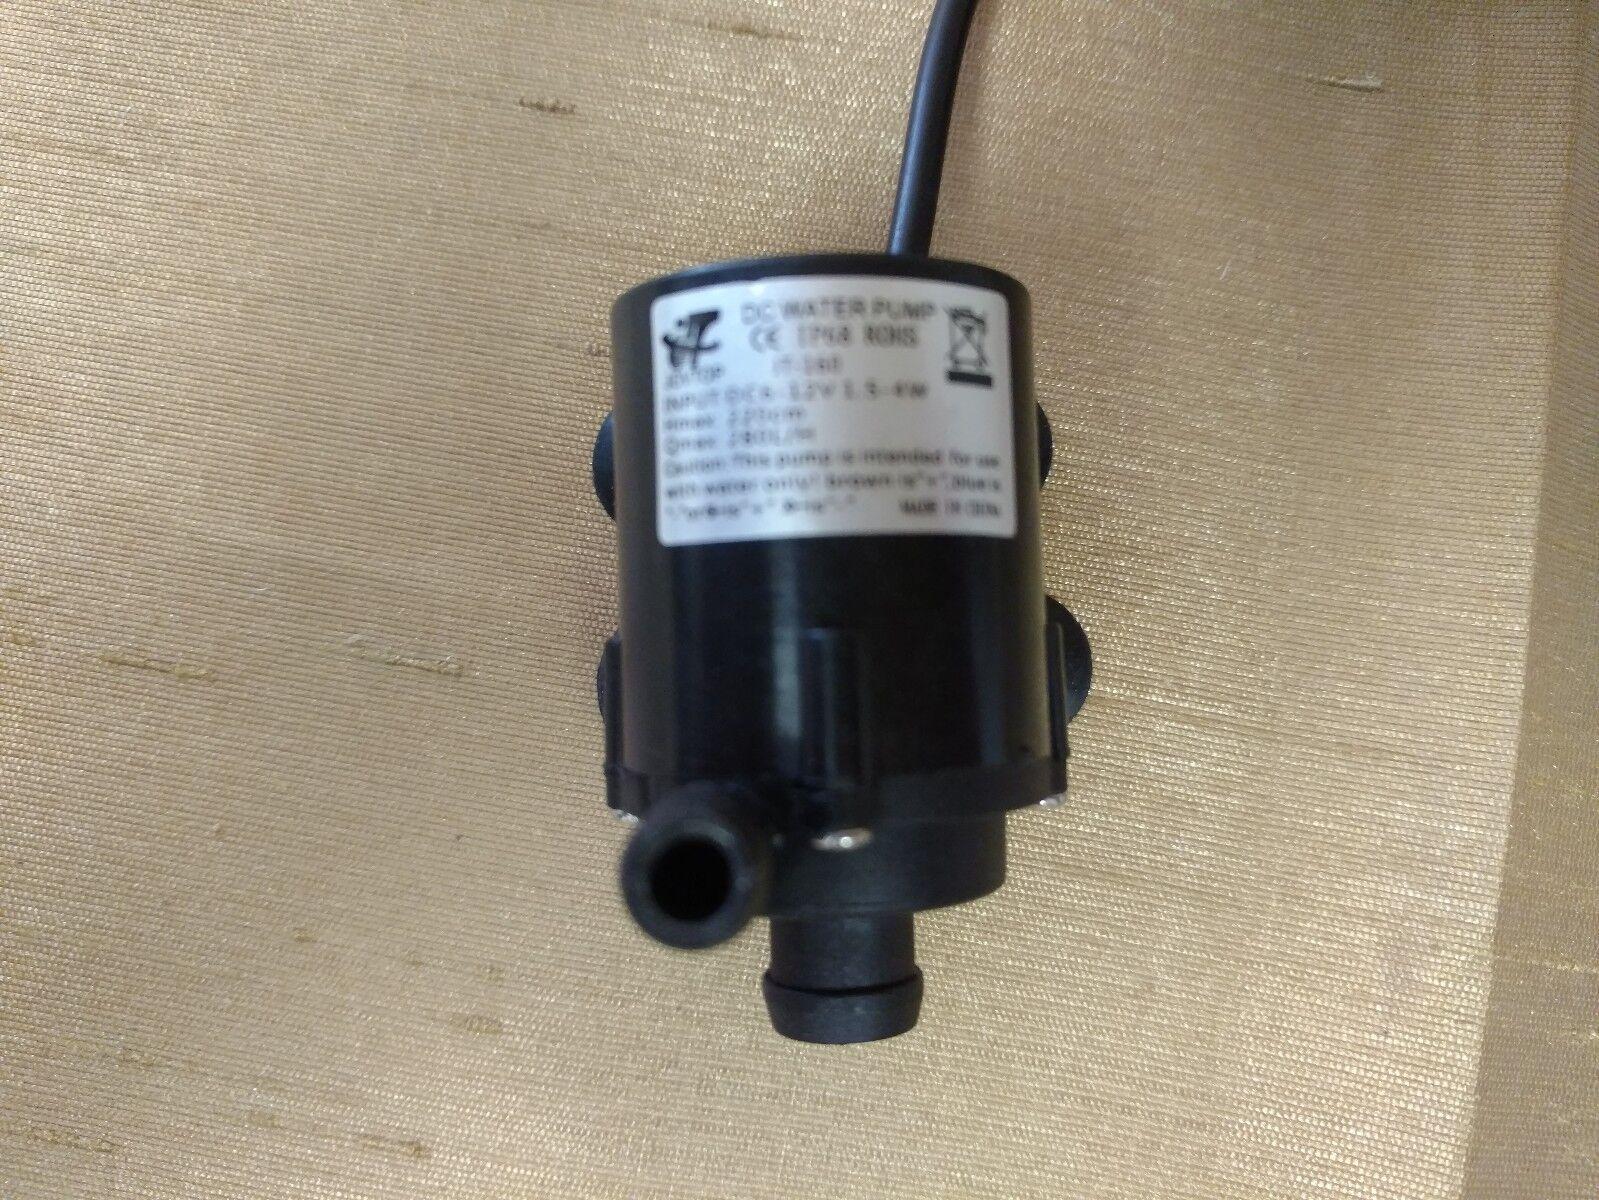 6V TO 12V SUBMERSIBLE DC WATER FOUNTAIN PUMP 40GPH @ 12VDC W FEMALE BARREL PLUG